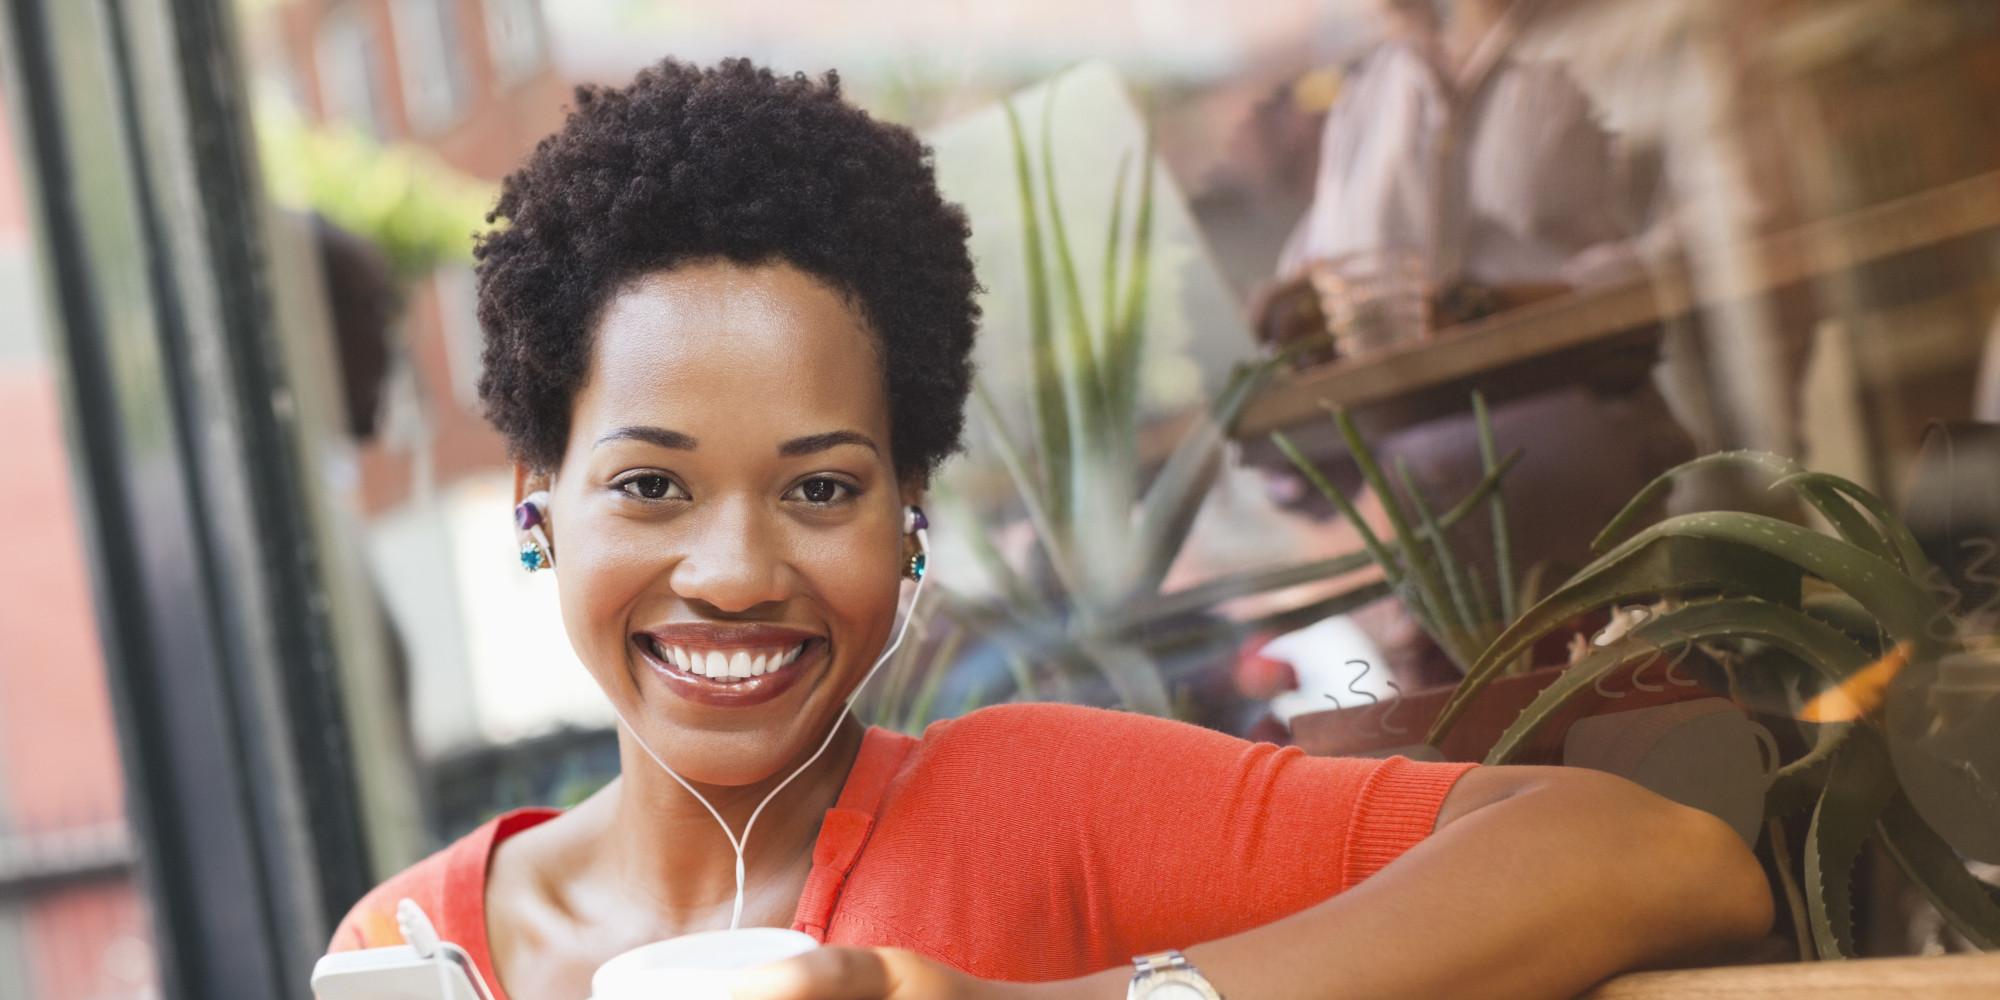 Woman listening to earphones by coffee shop